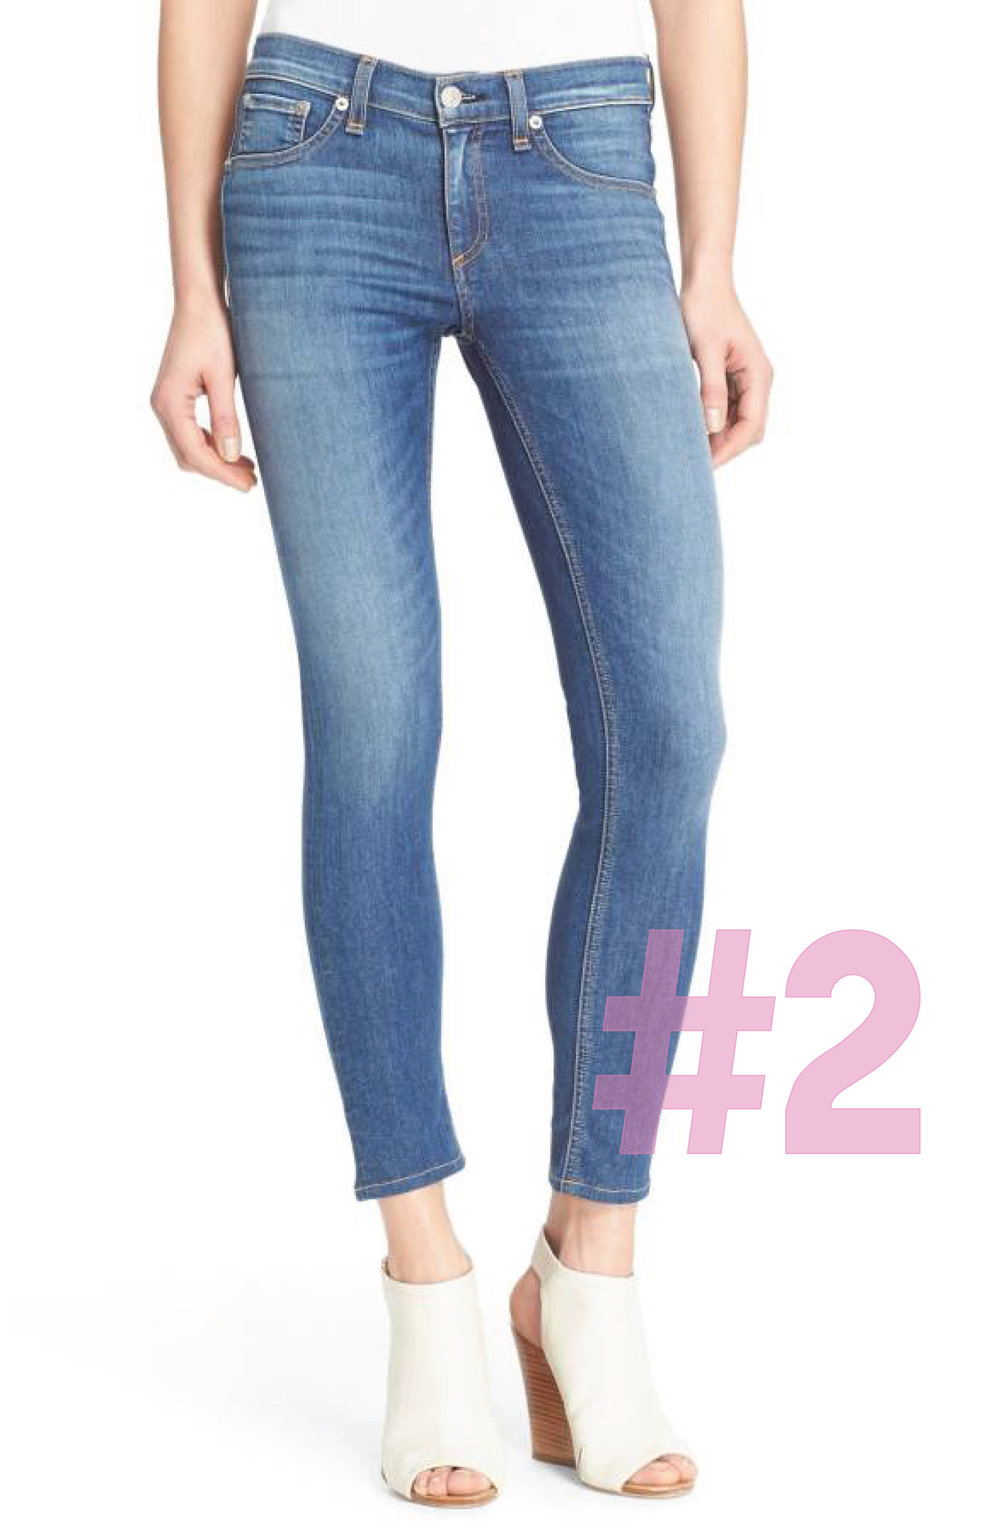 Jeans-2.jpg